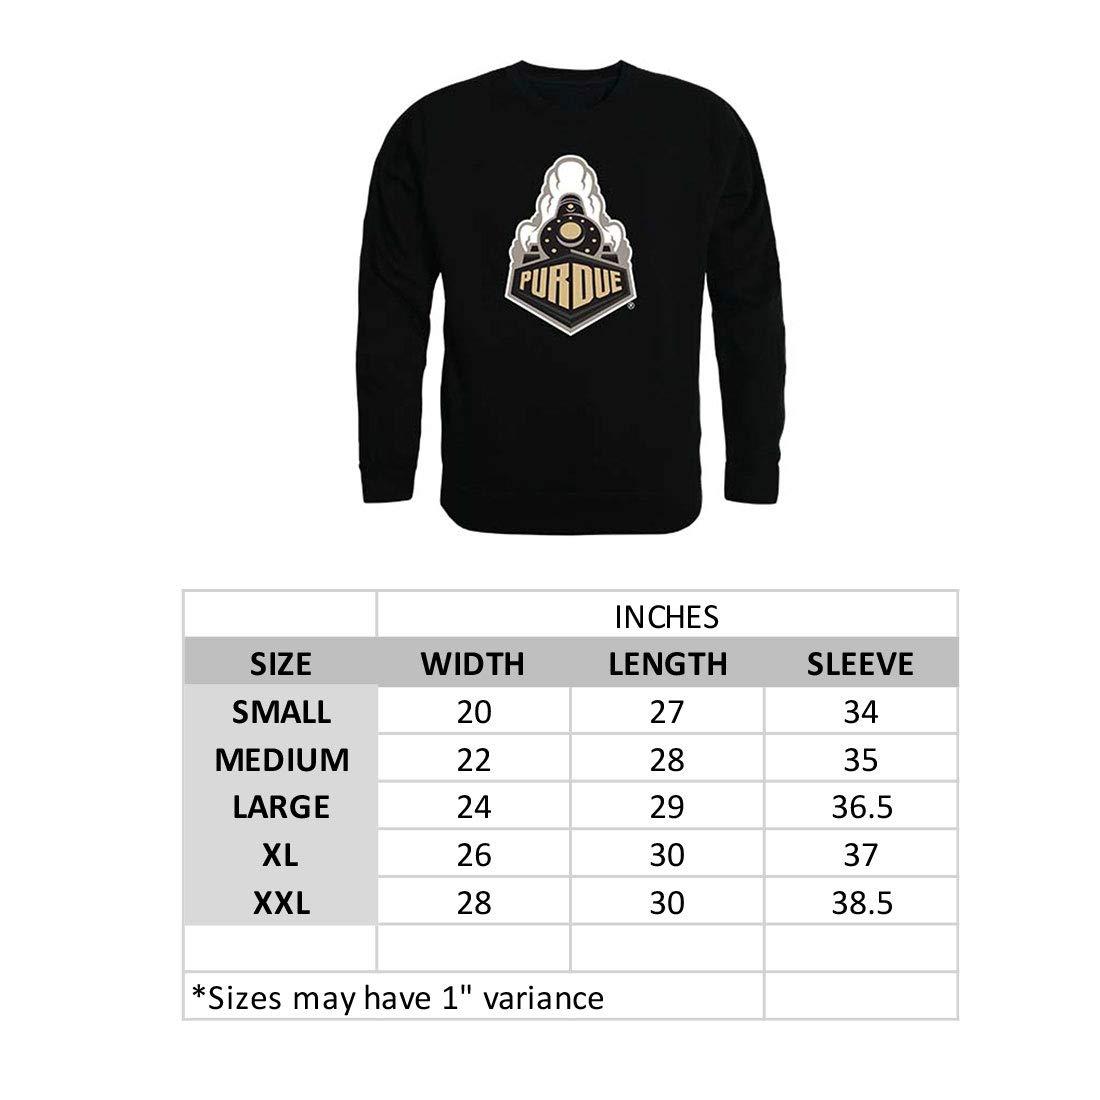 W Republic Nicholls State University Campus Crewneck Pullover Sweatshirt Sweater Heather Charcoal